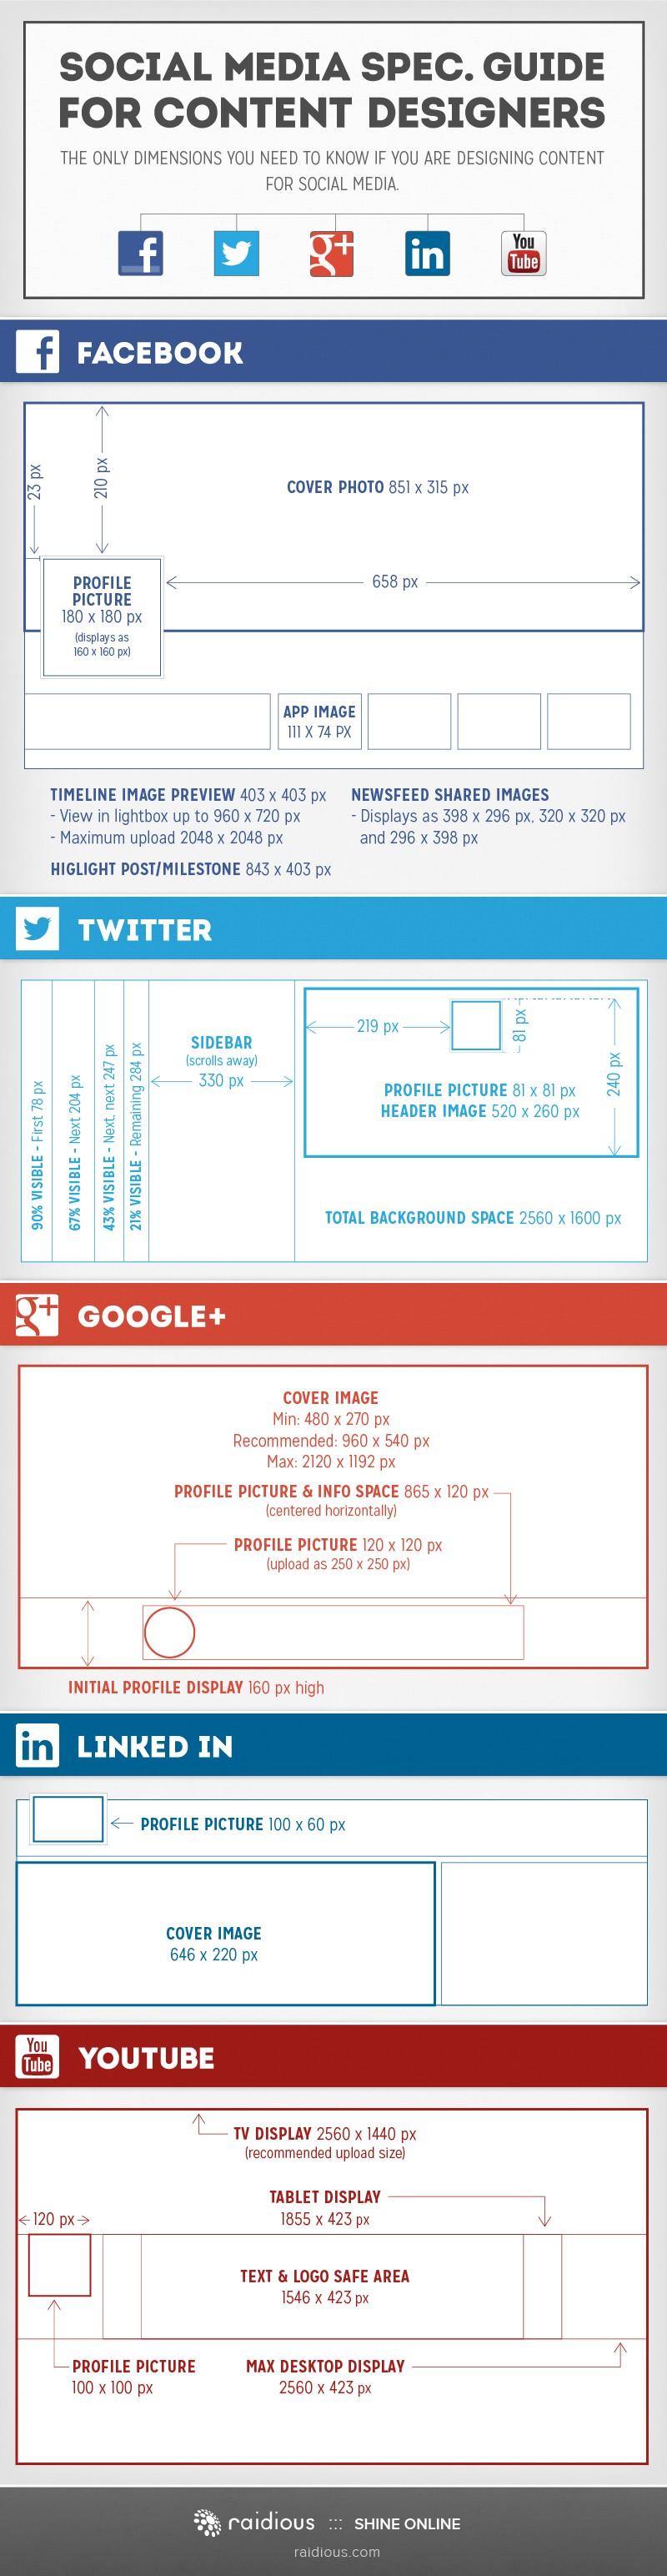 Guías de branding para redes sociales